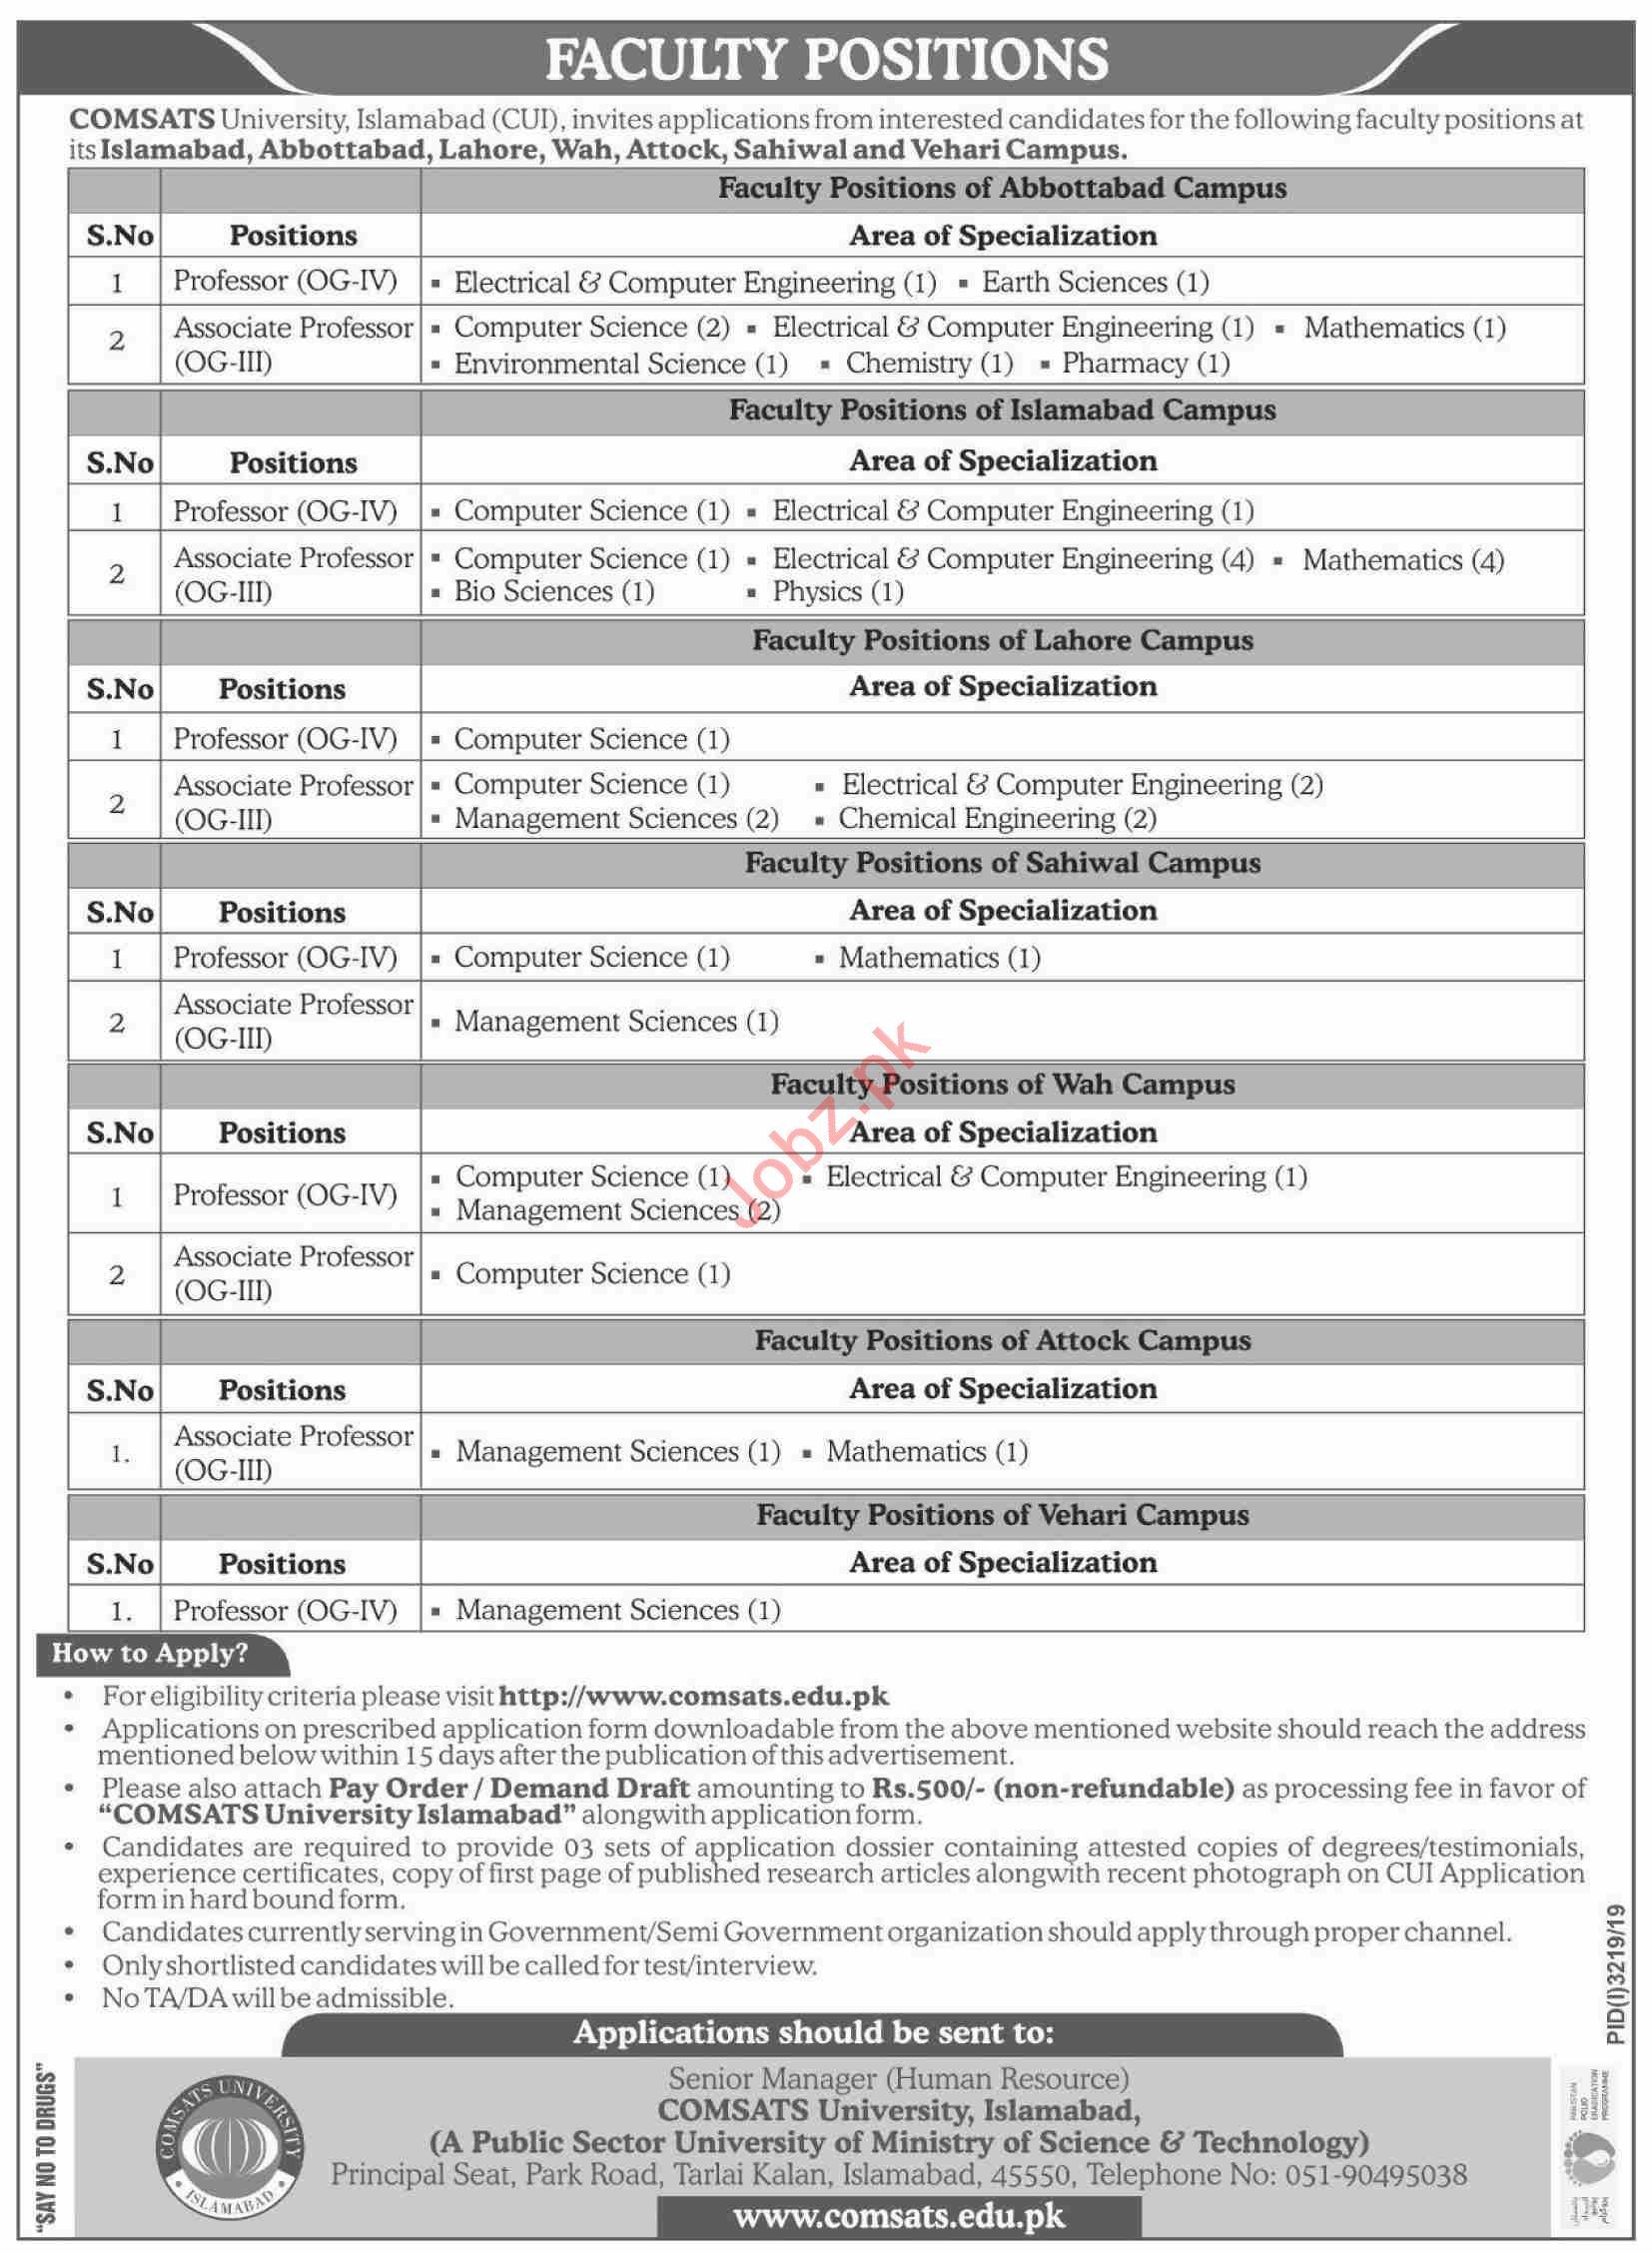 Comsats University Islamabad CUI Jobs 2019 for Professors